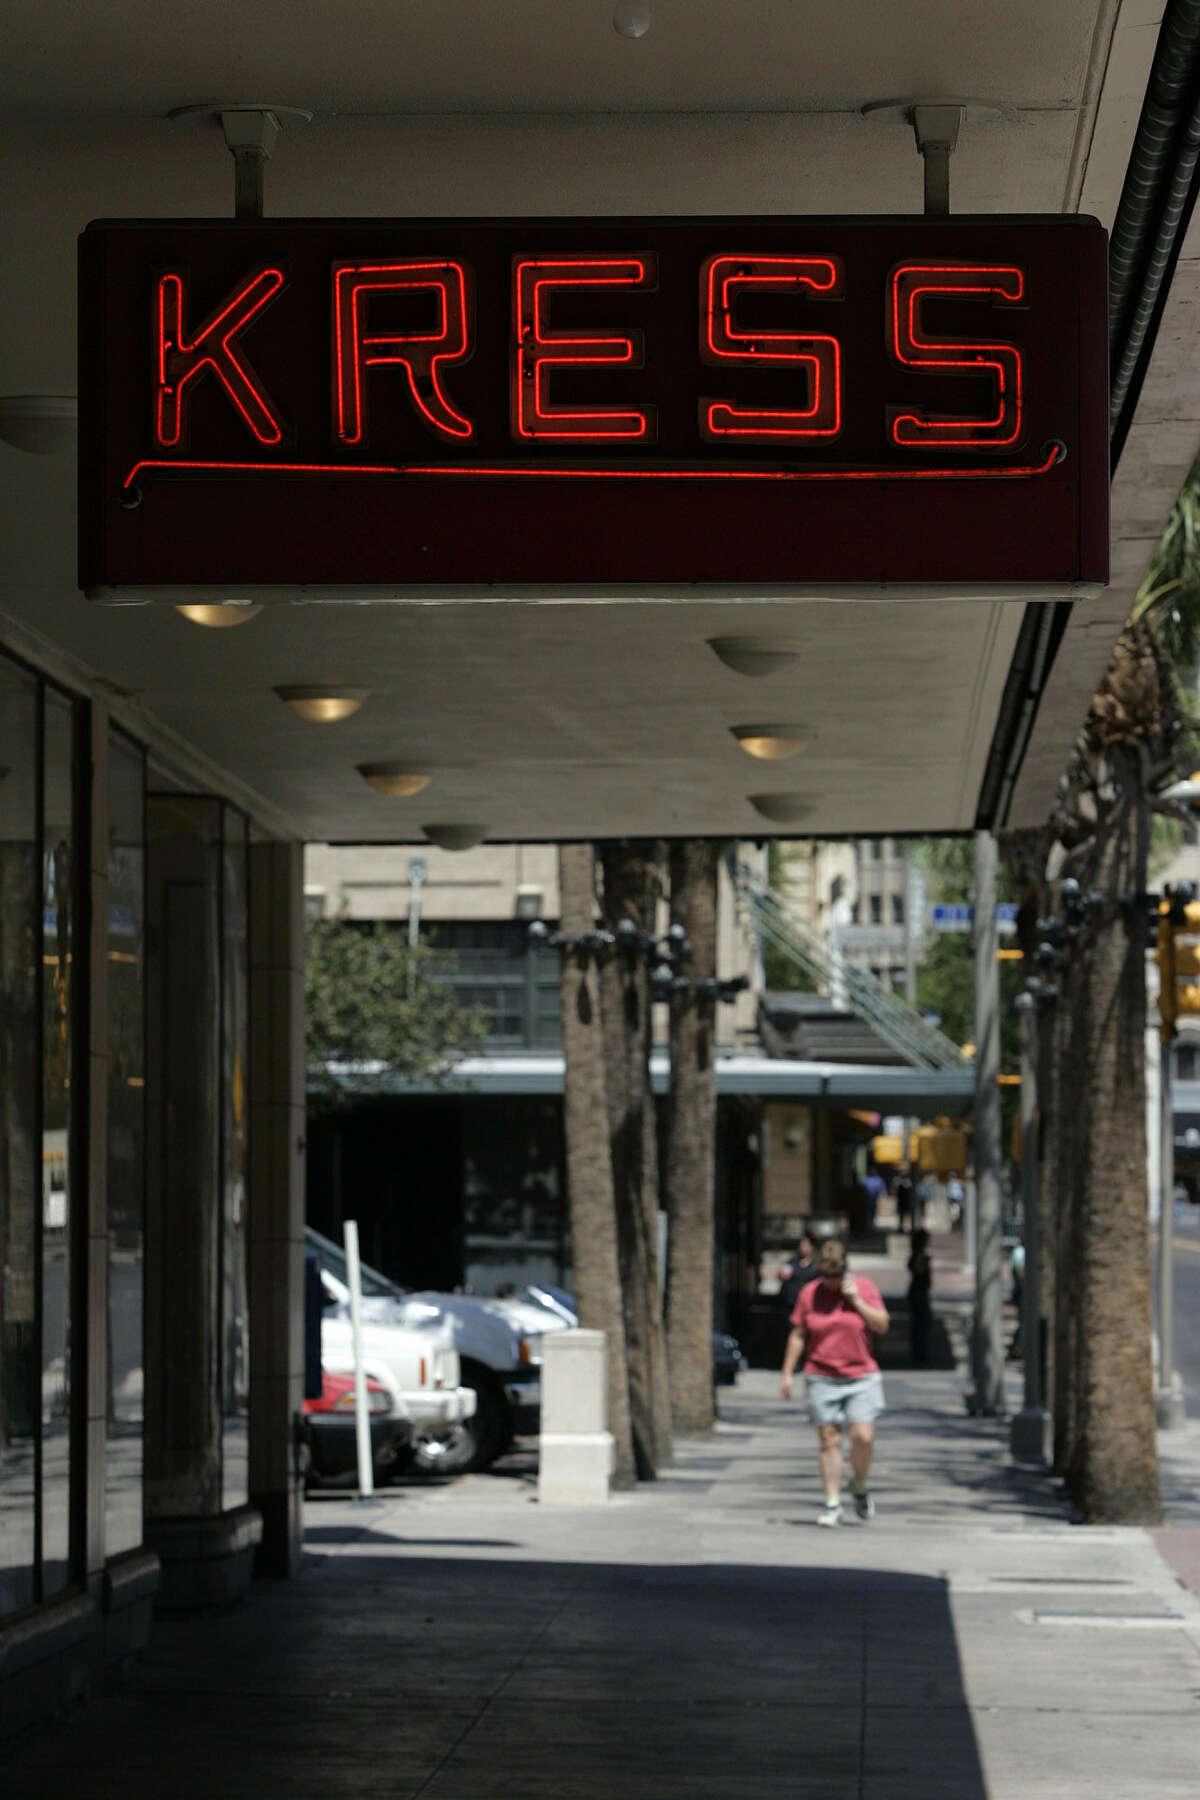 The Kress Building.